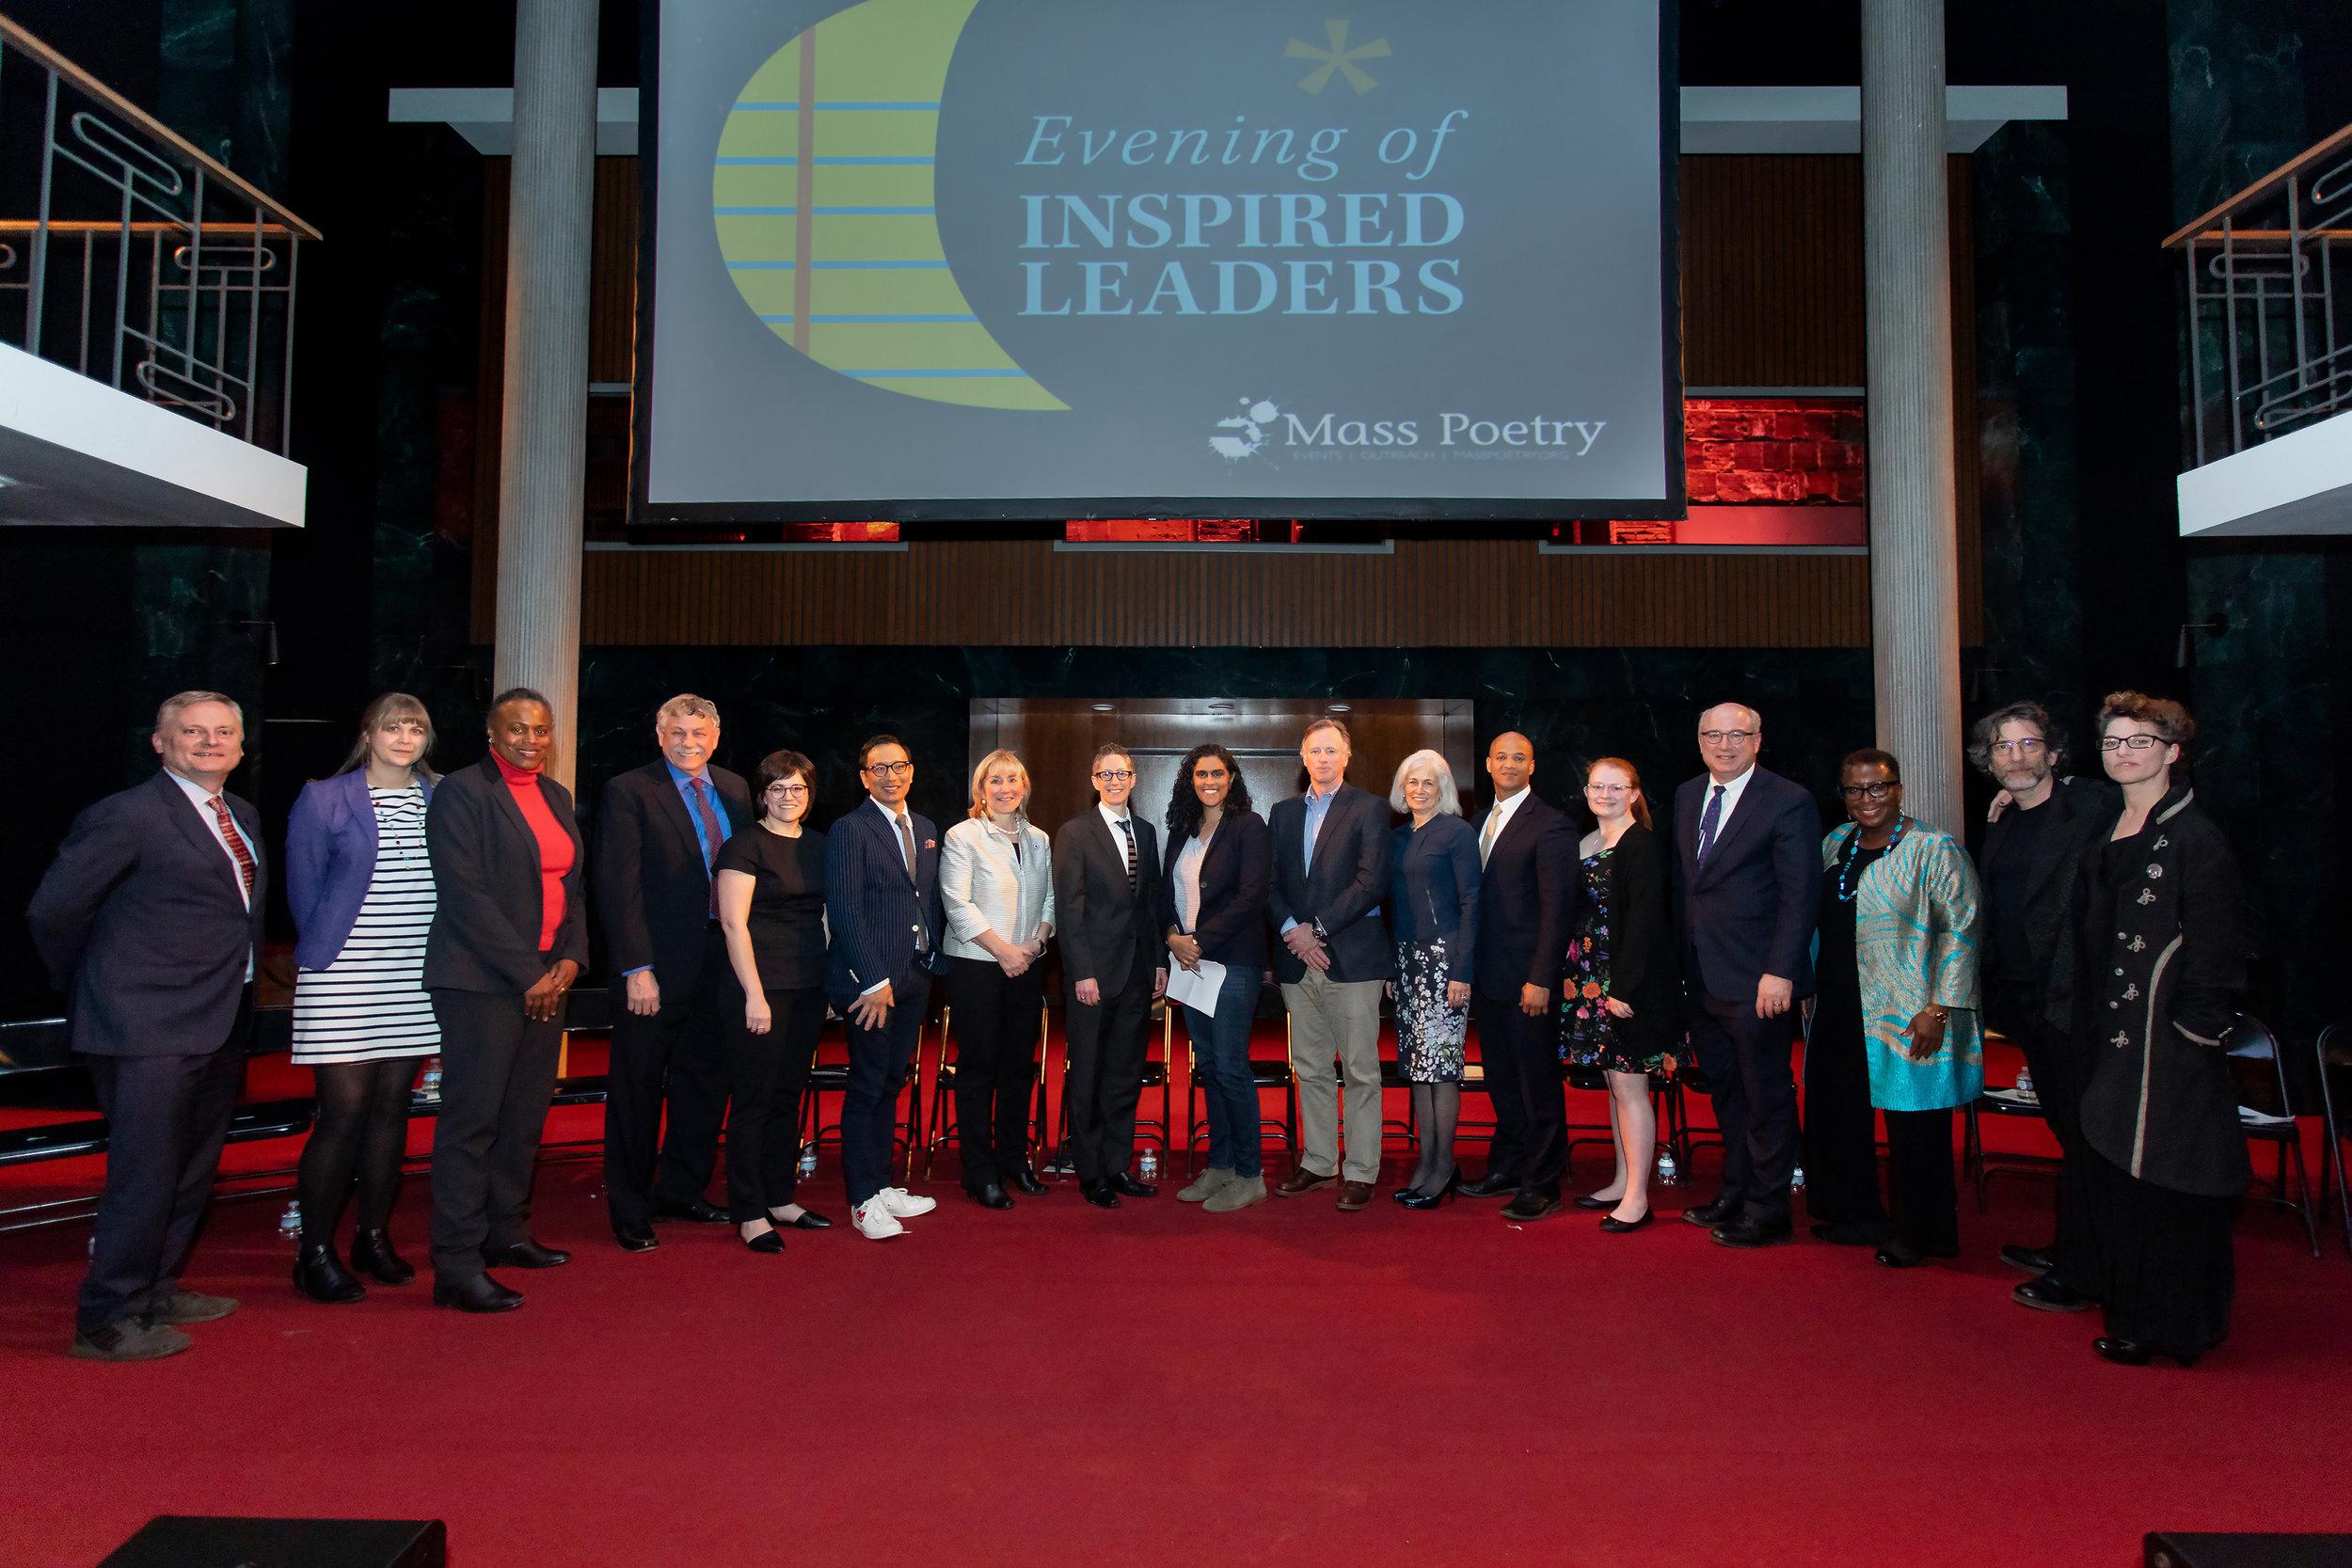 Evening of Inspired Leaders_233.JPG